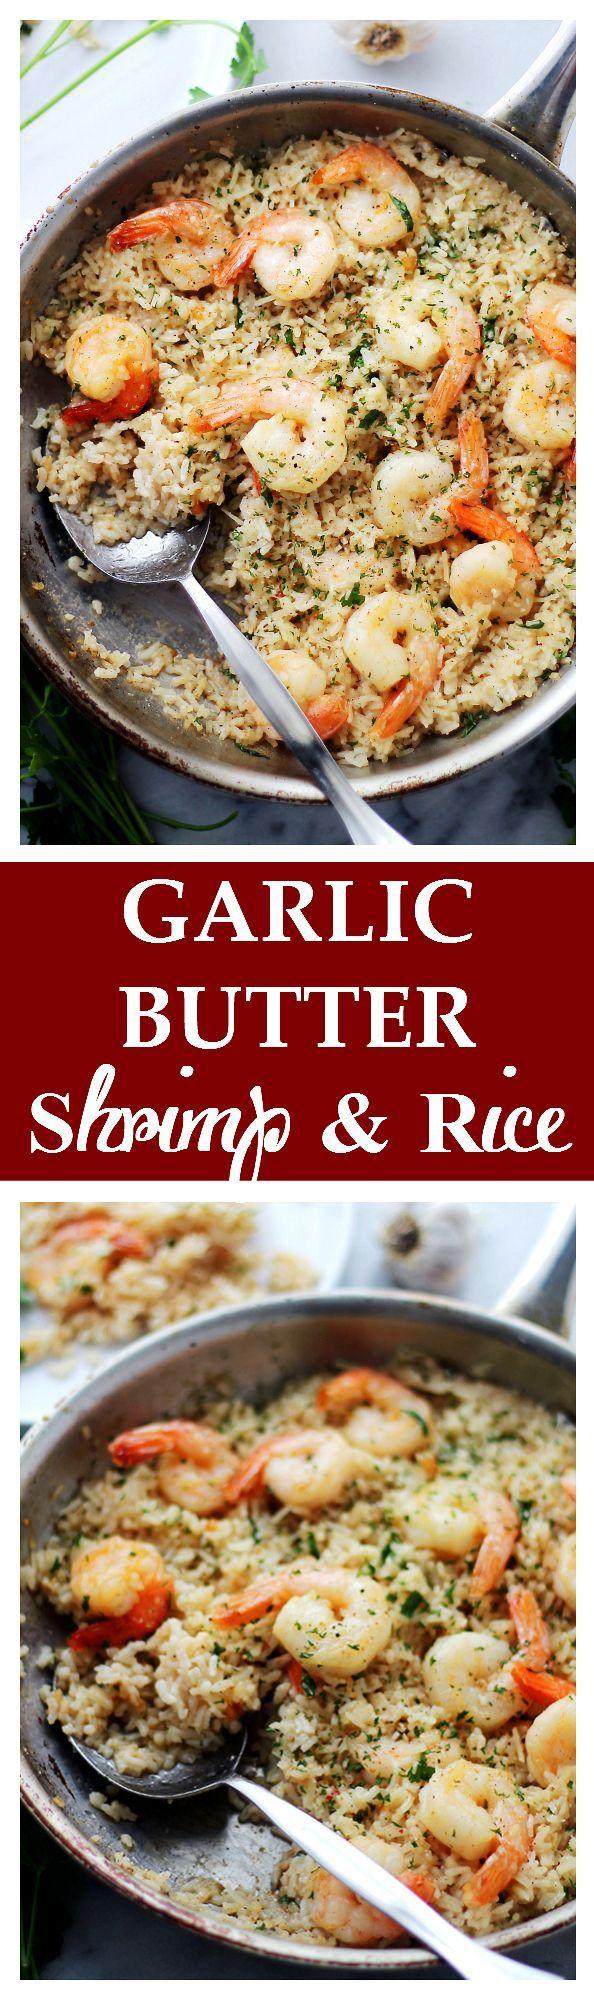 Garlic Butter Shrimp and Rice Recipe